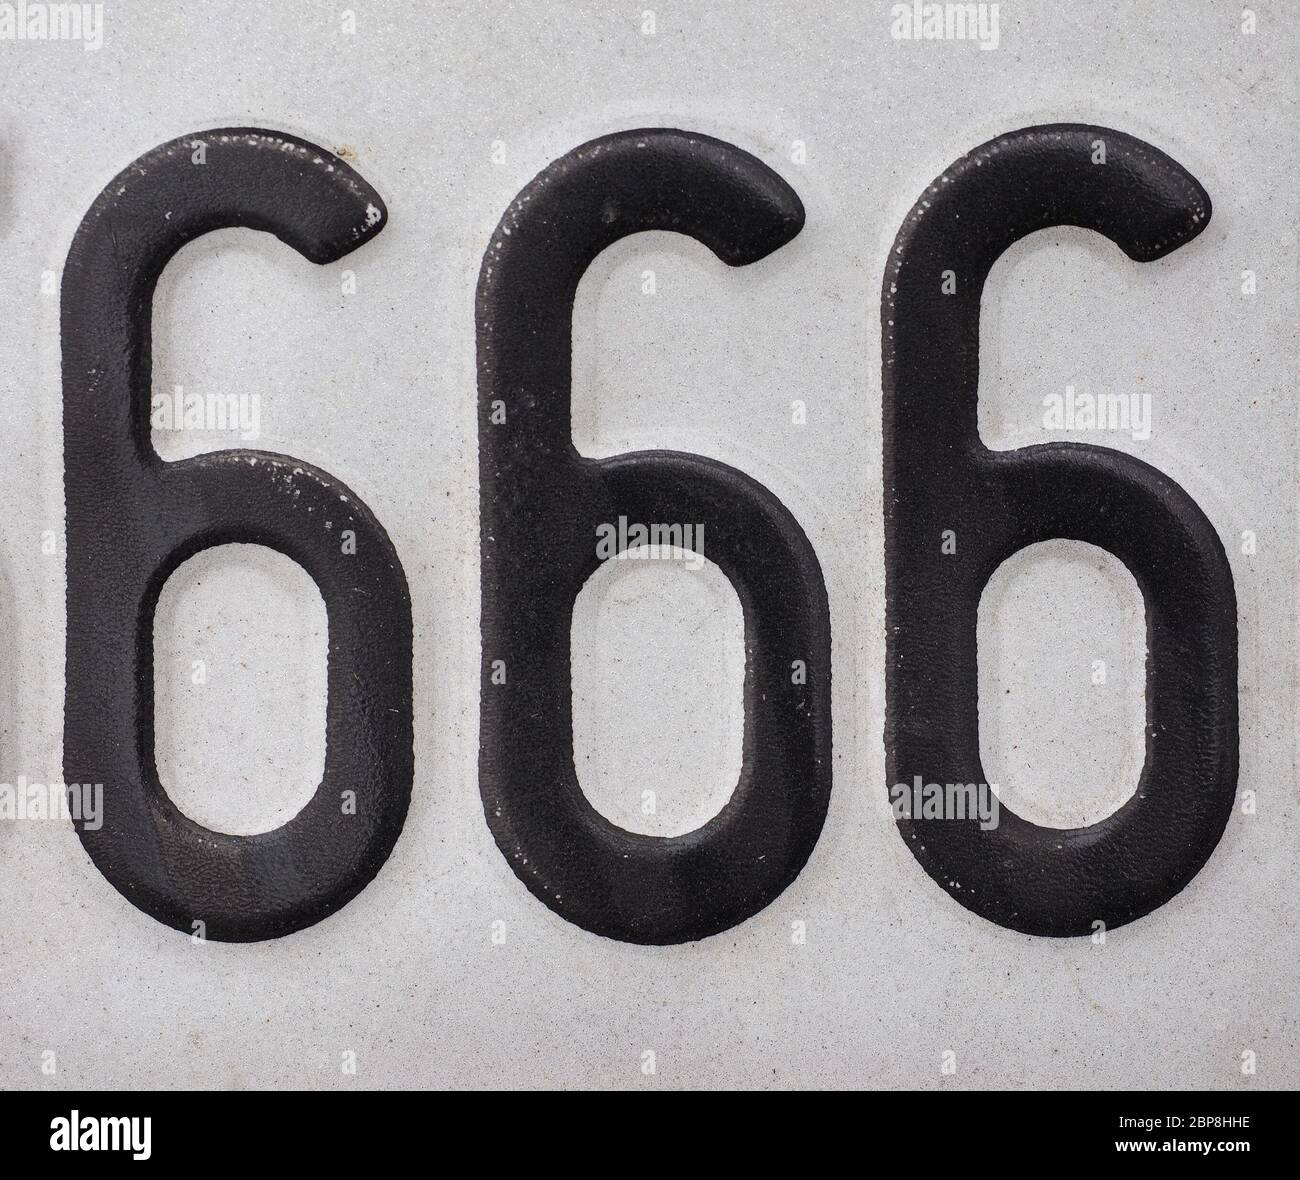 Zahl des teufels 666 bedeutung